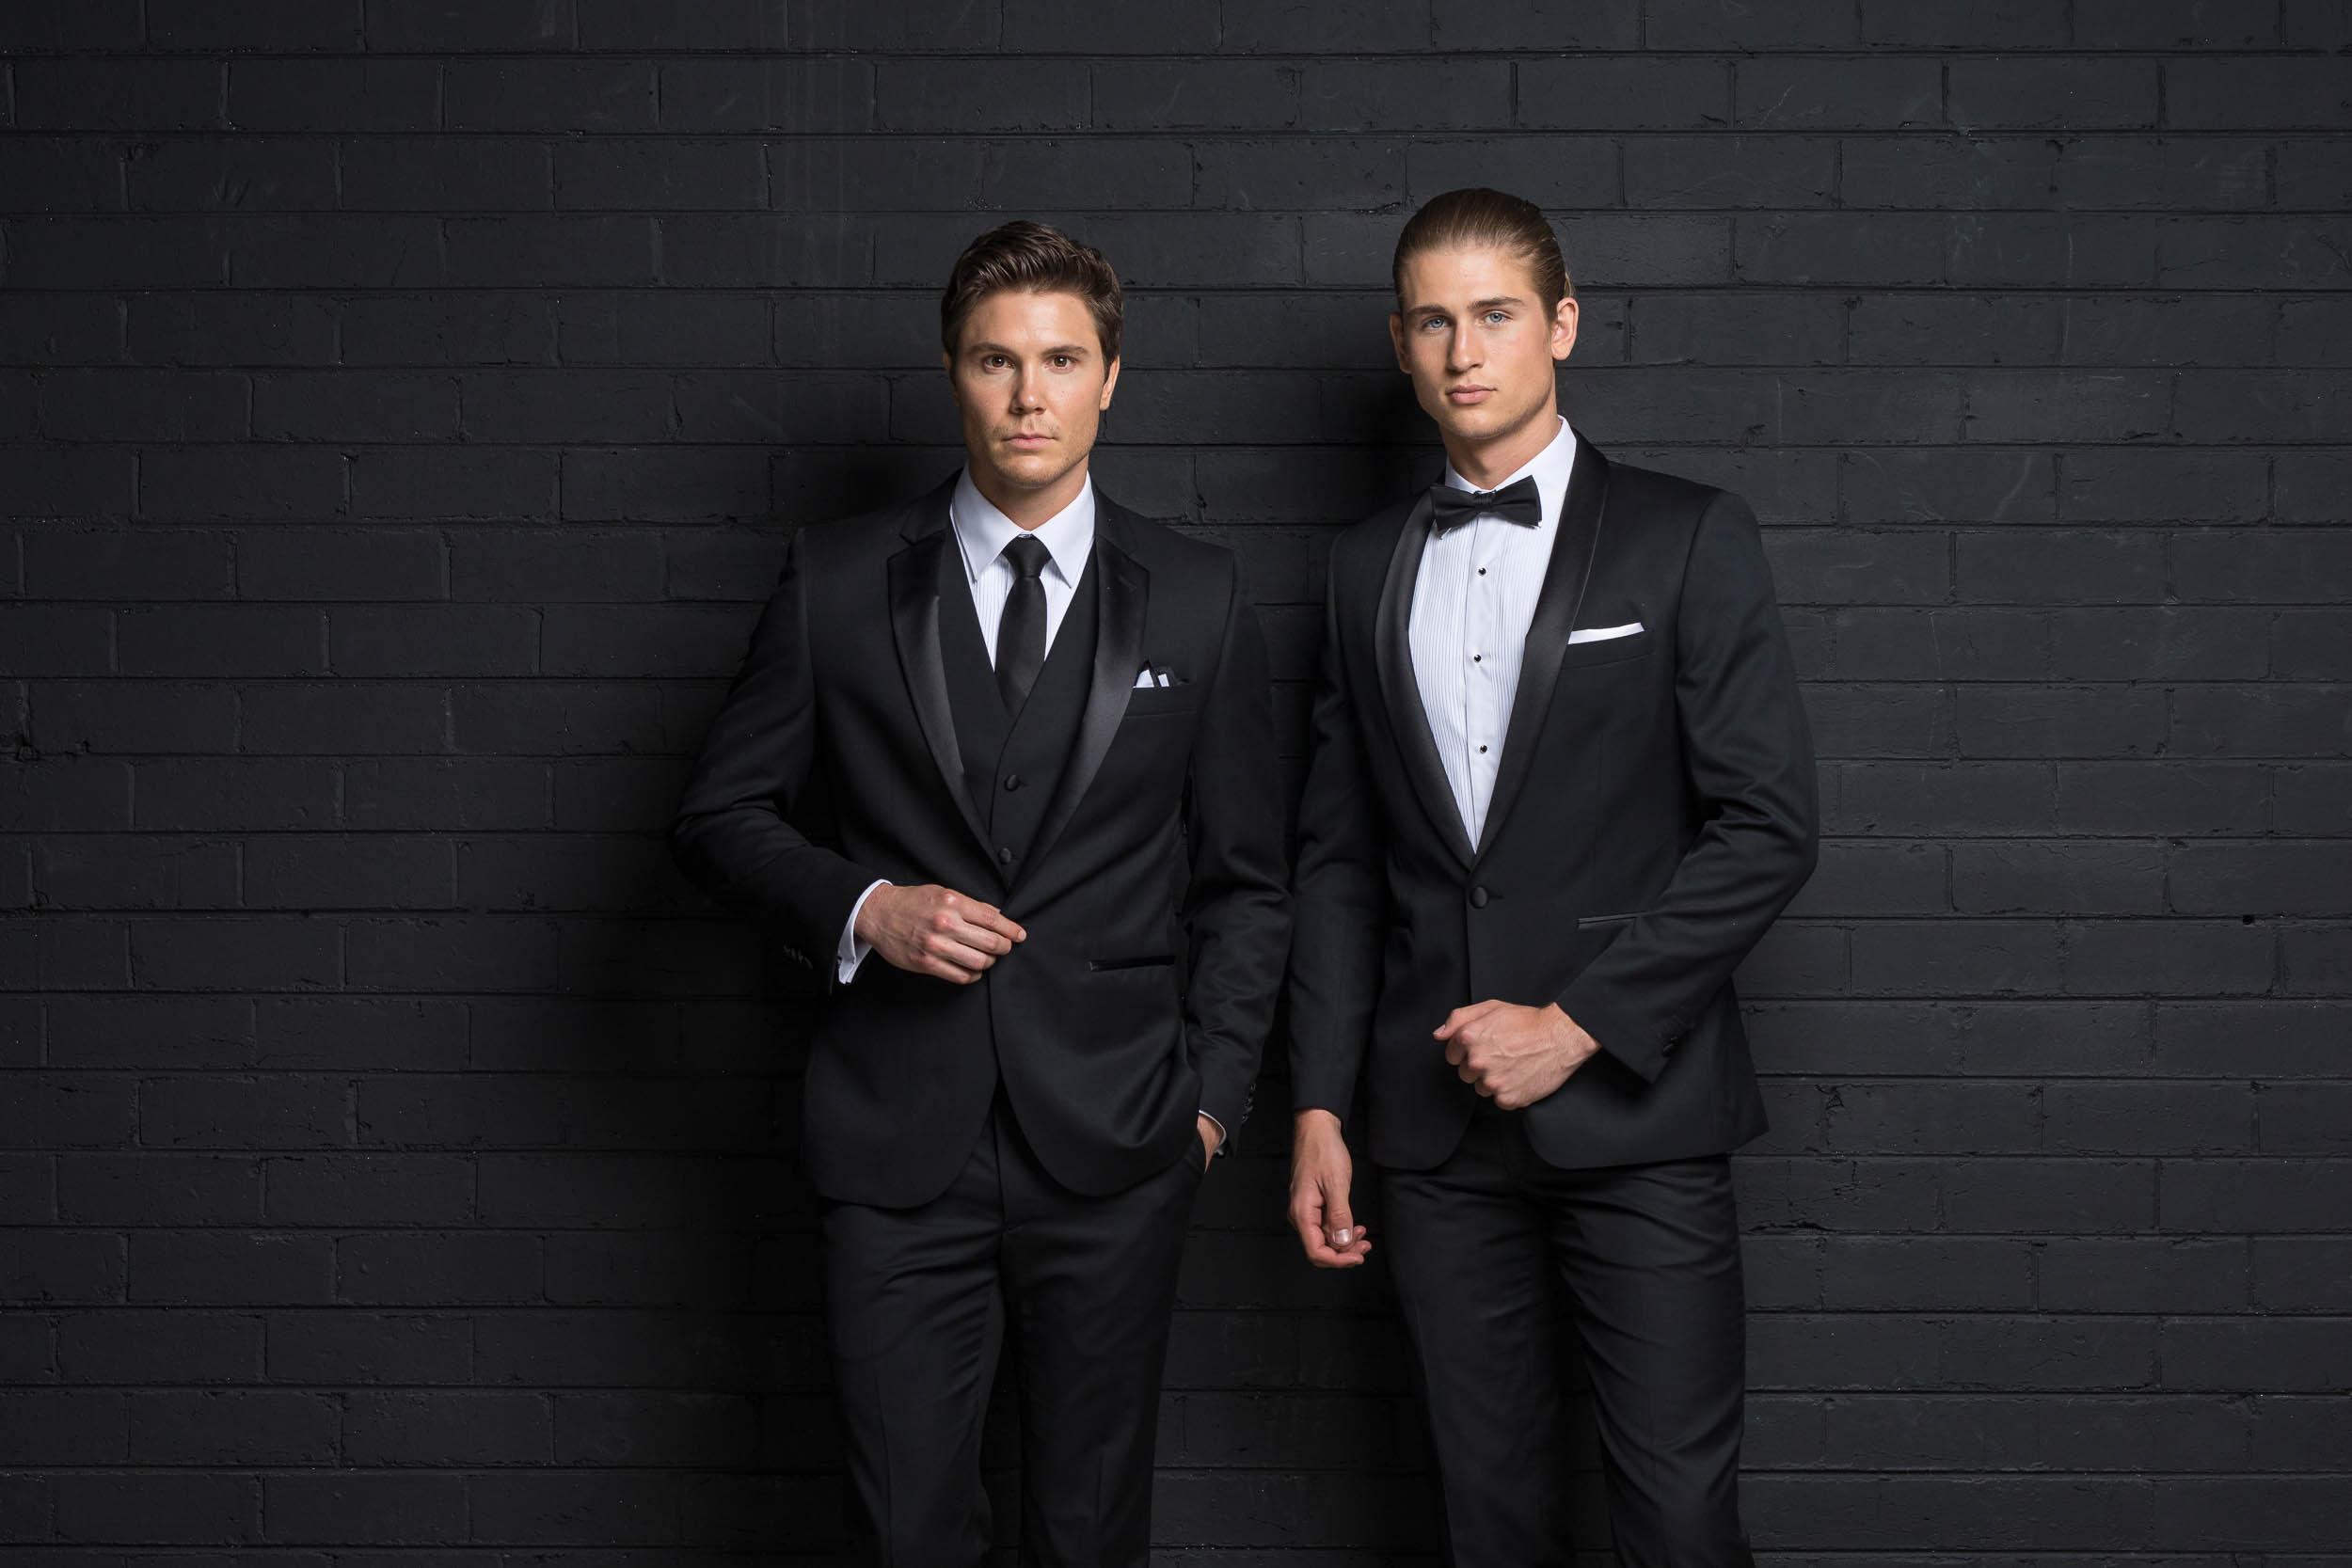 Commercial Mens Fashion Photography by Nick Walters for Ferrari Formalwear2.jpg